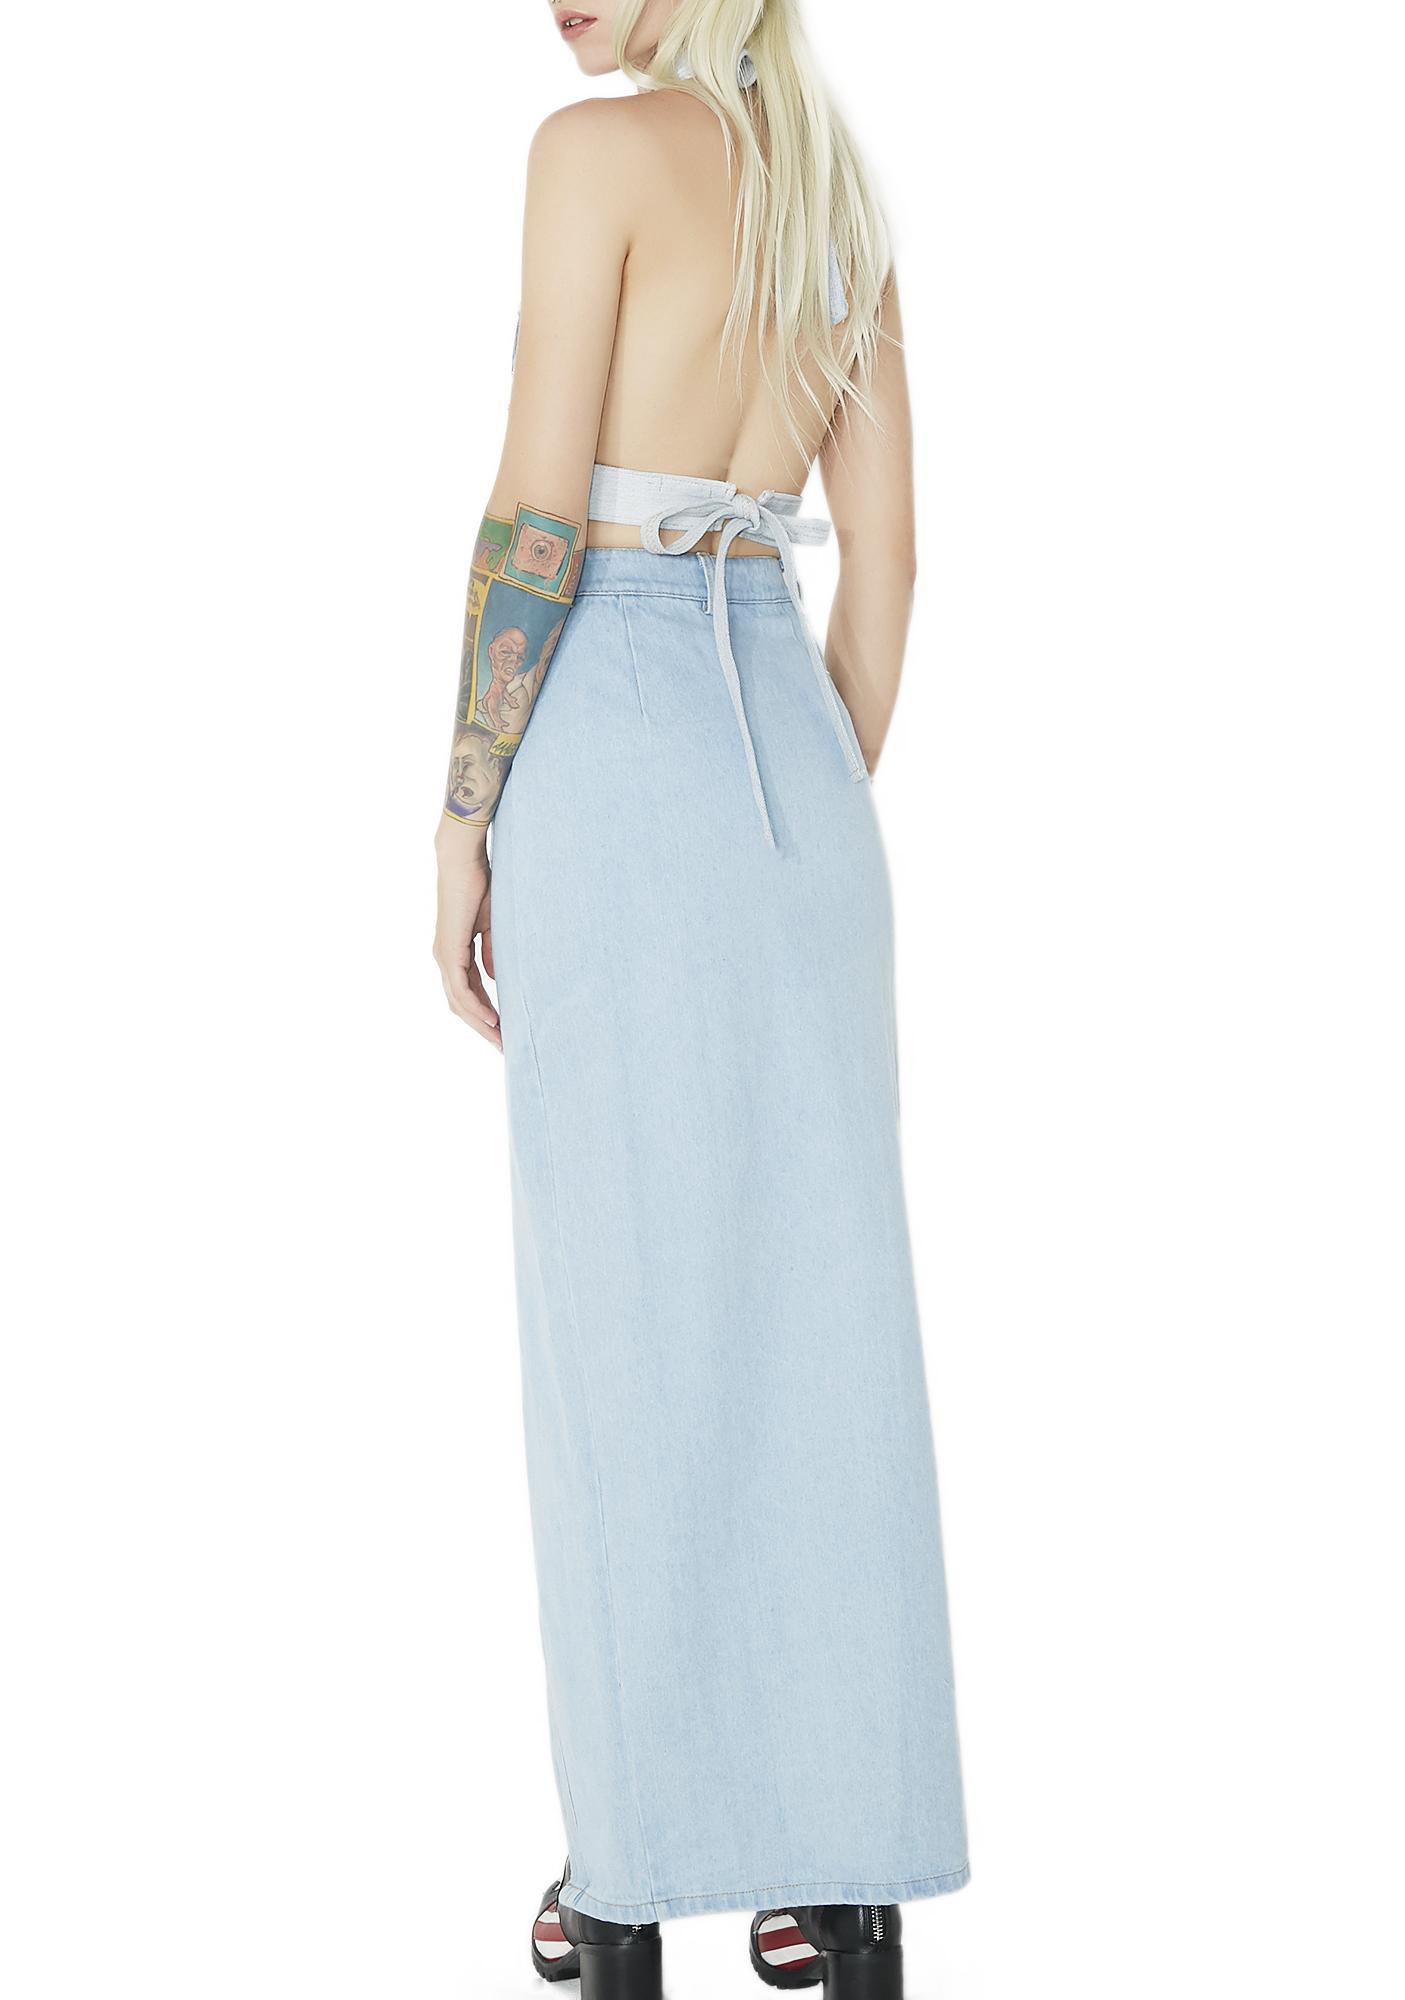 Indigo Skies Maxi Skirt